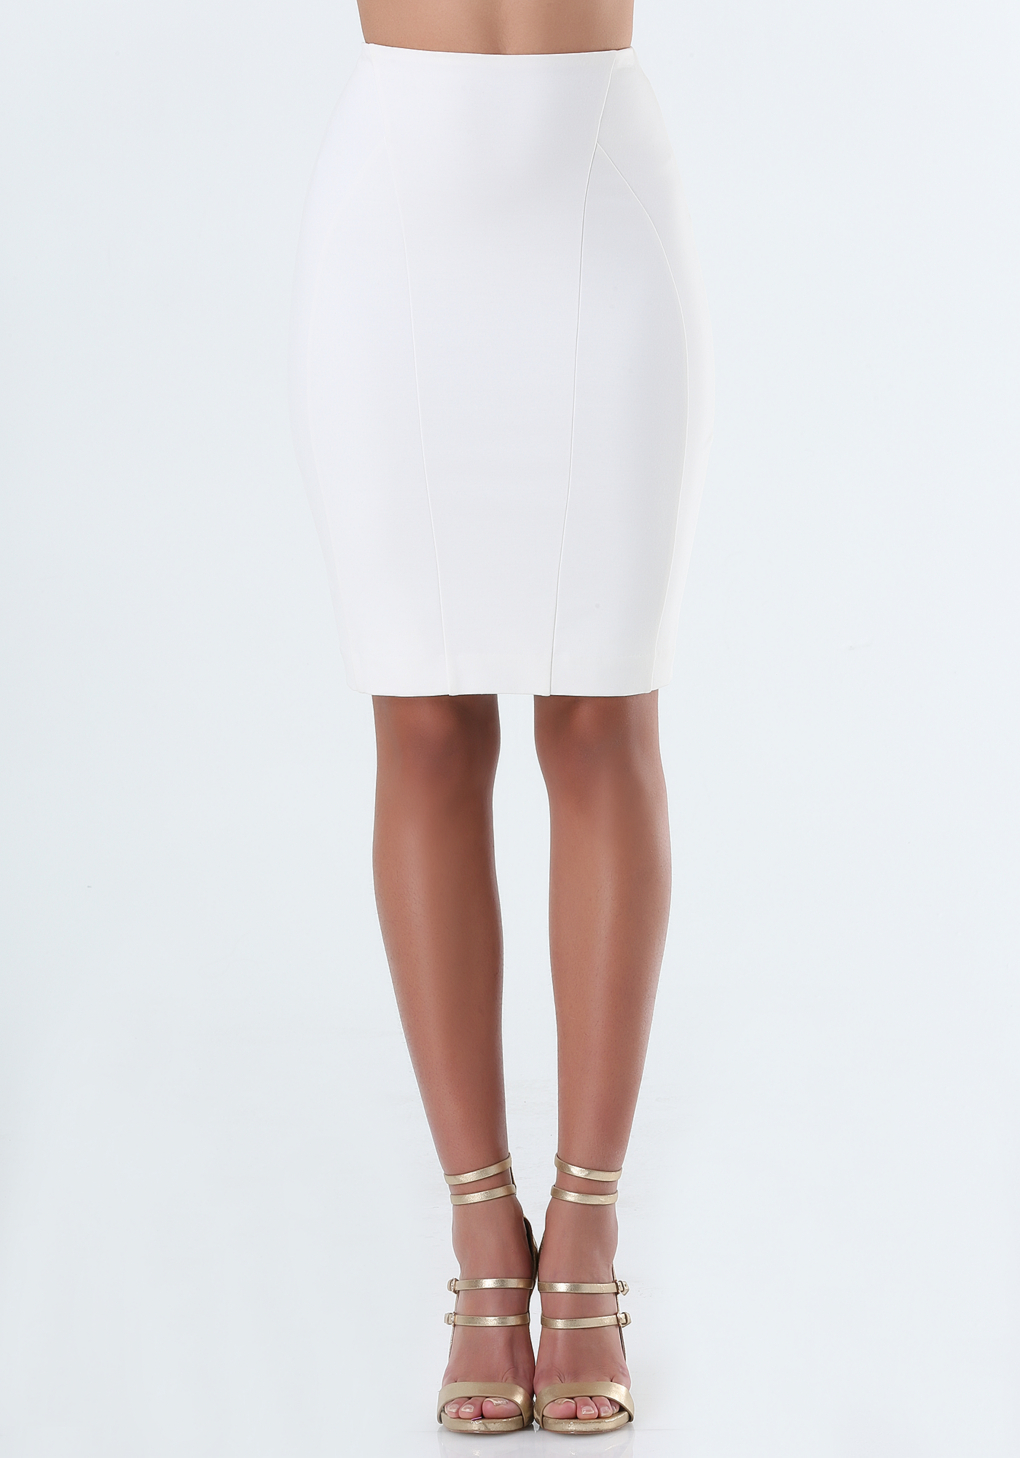 bebe seamed pencil skirt in white lyst